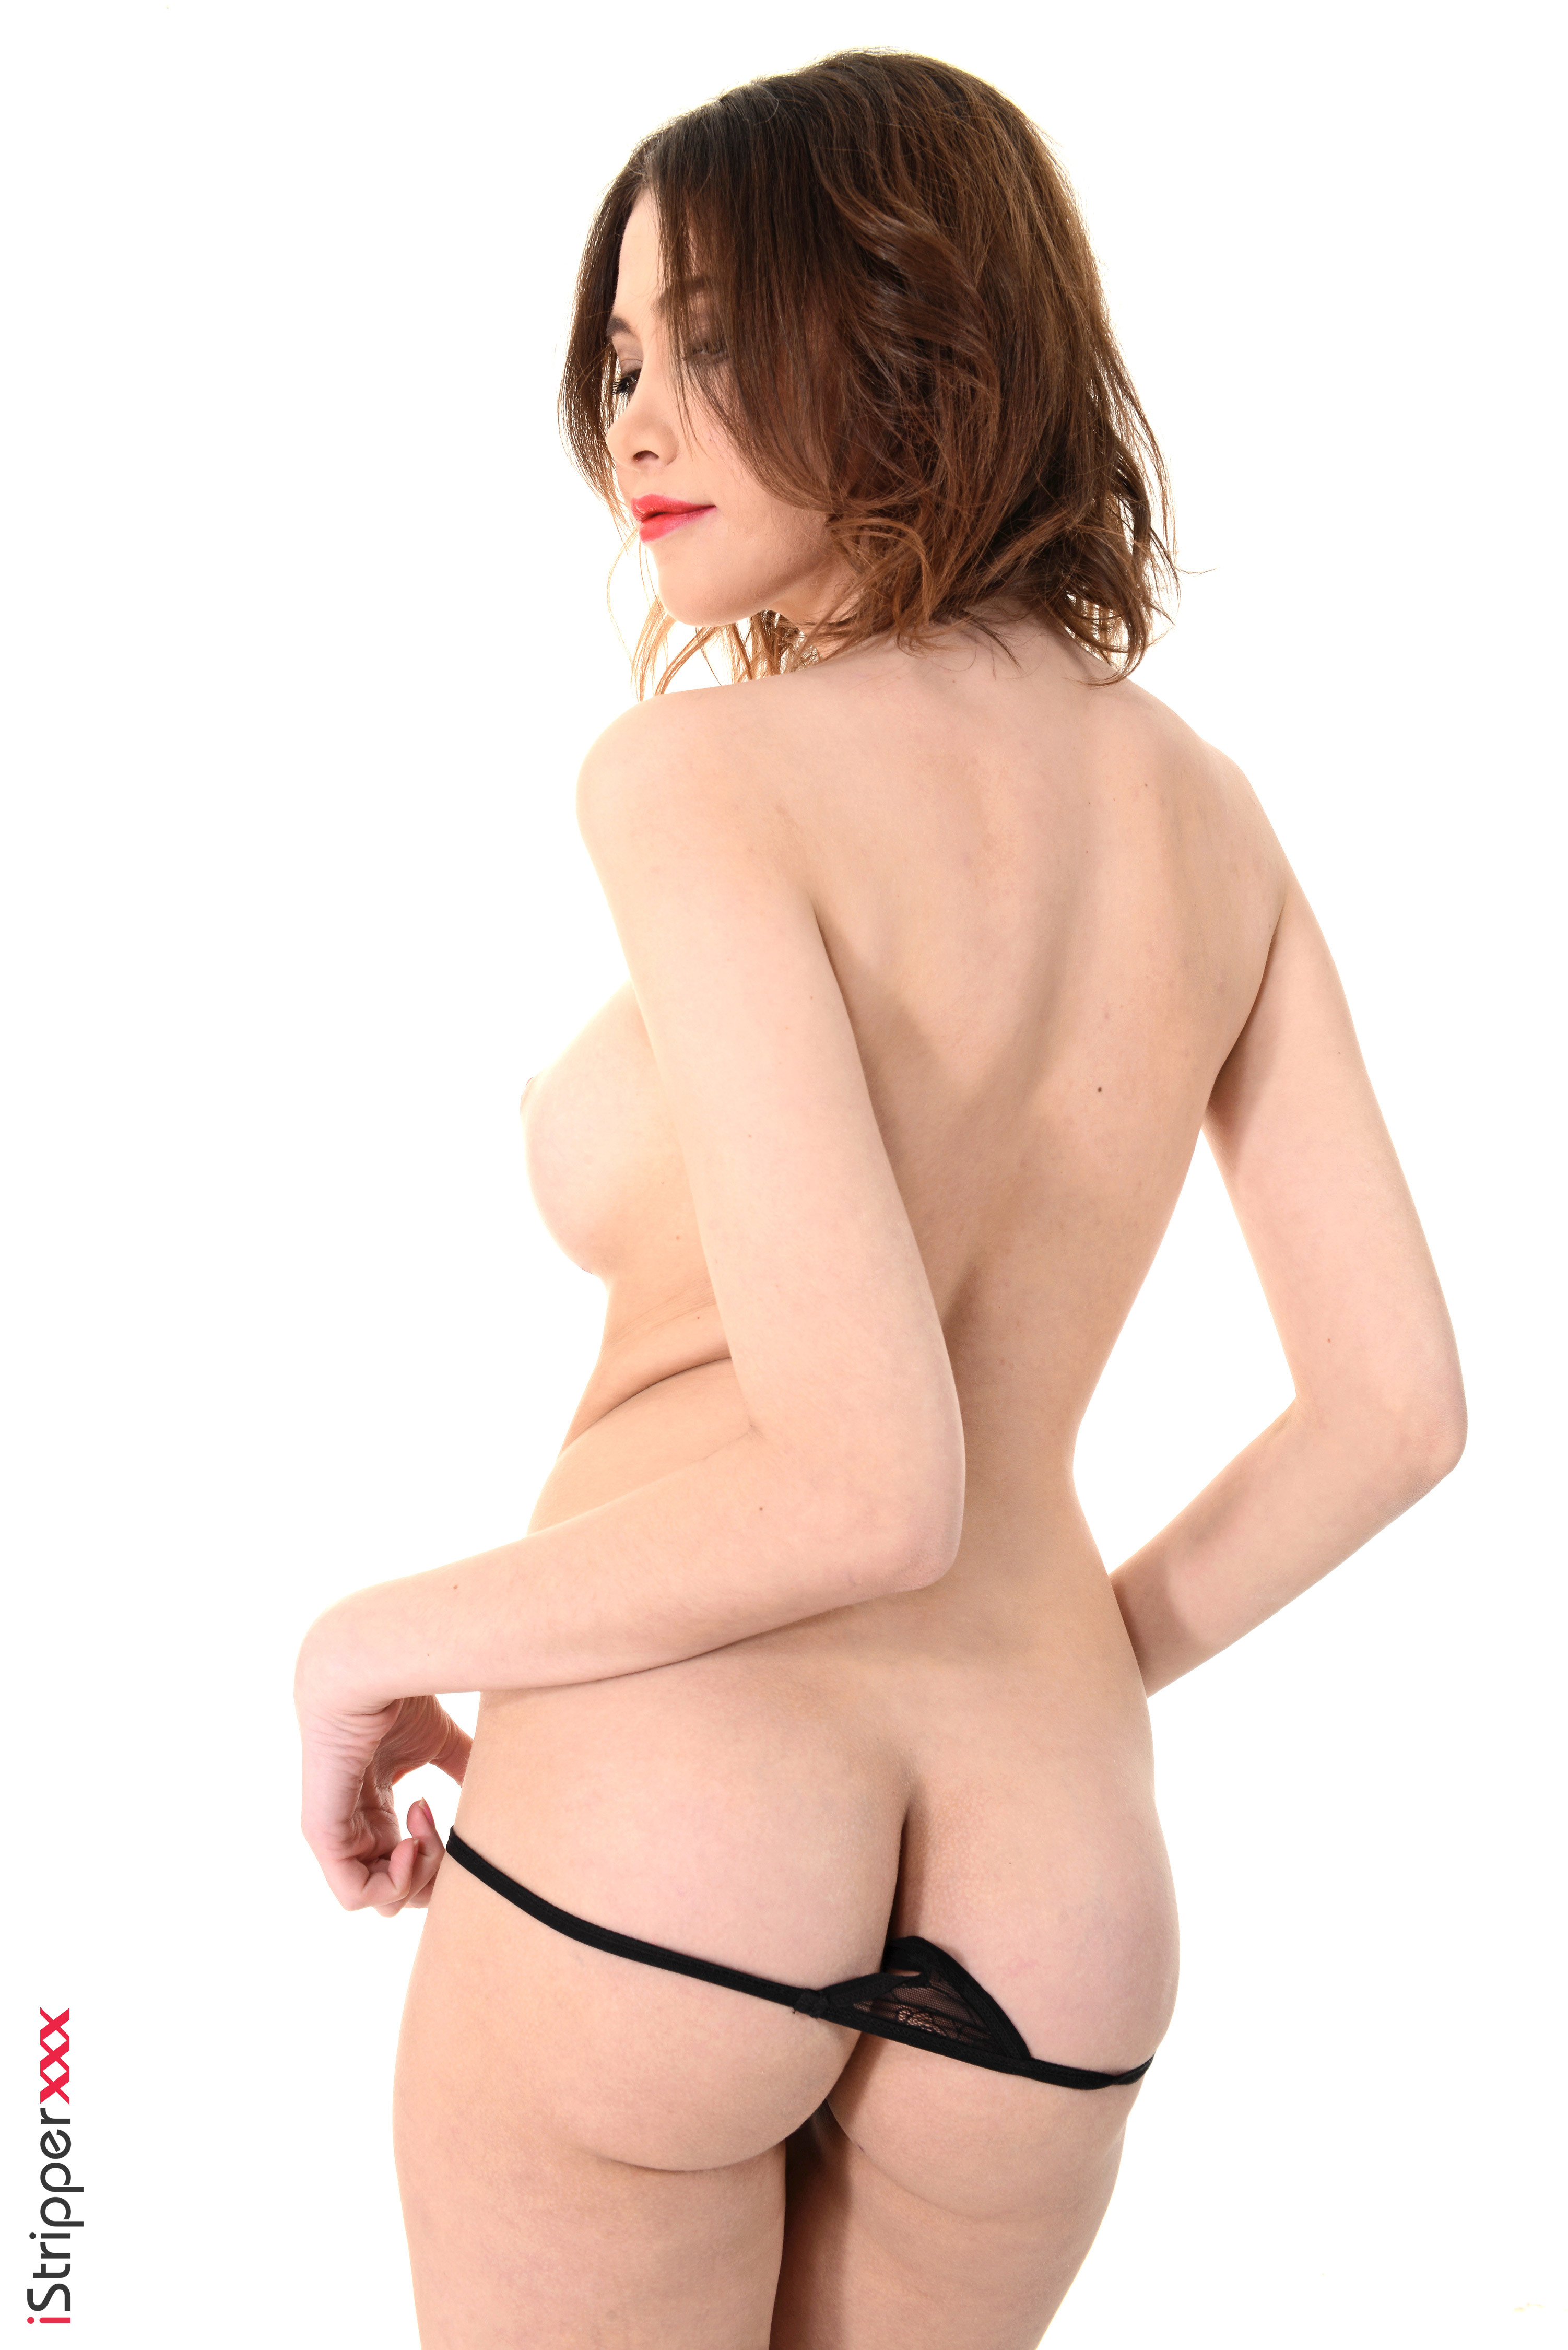 naked hot wallpaper